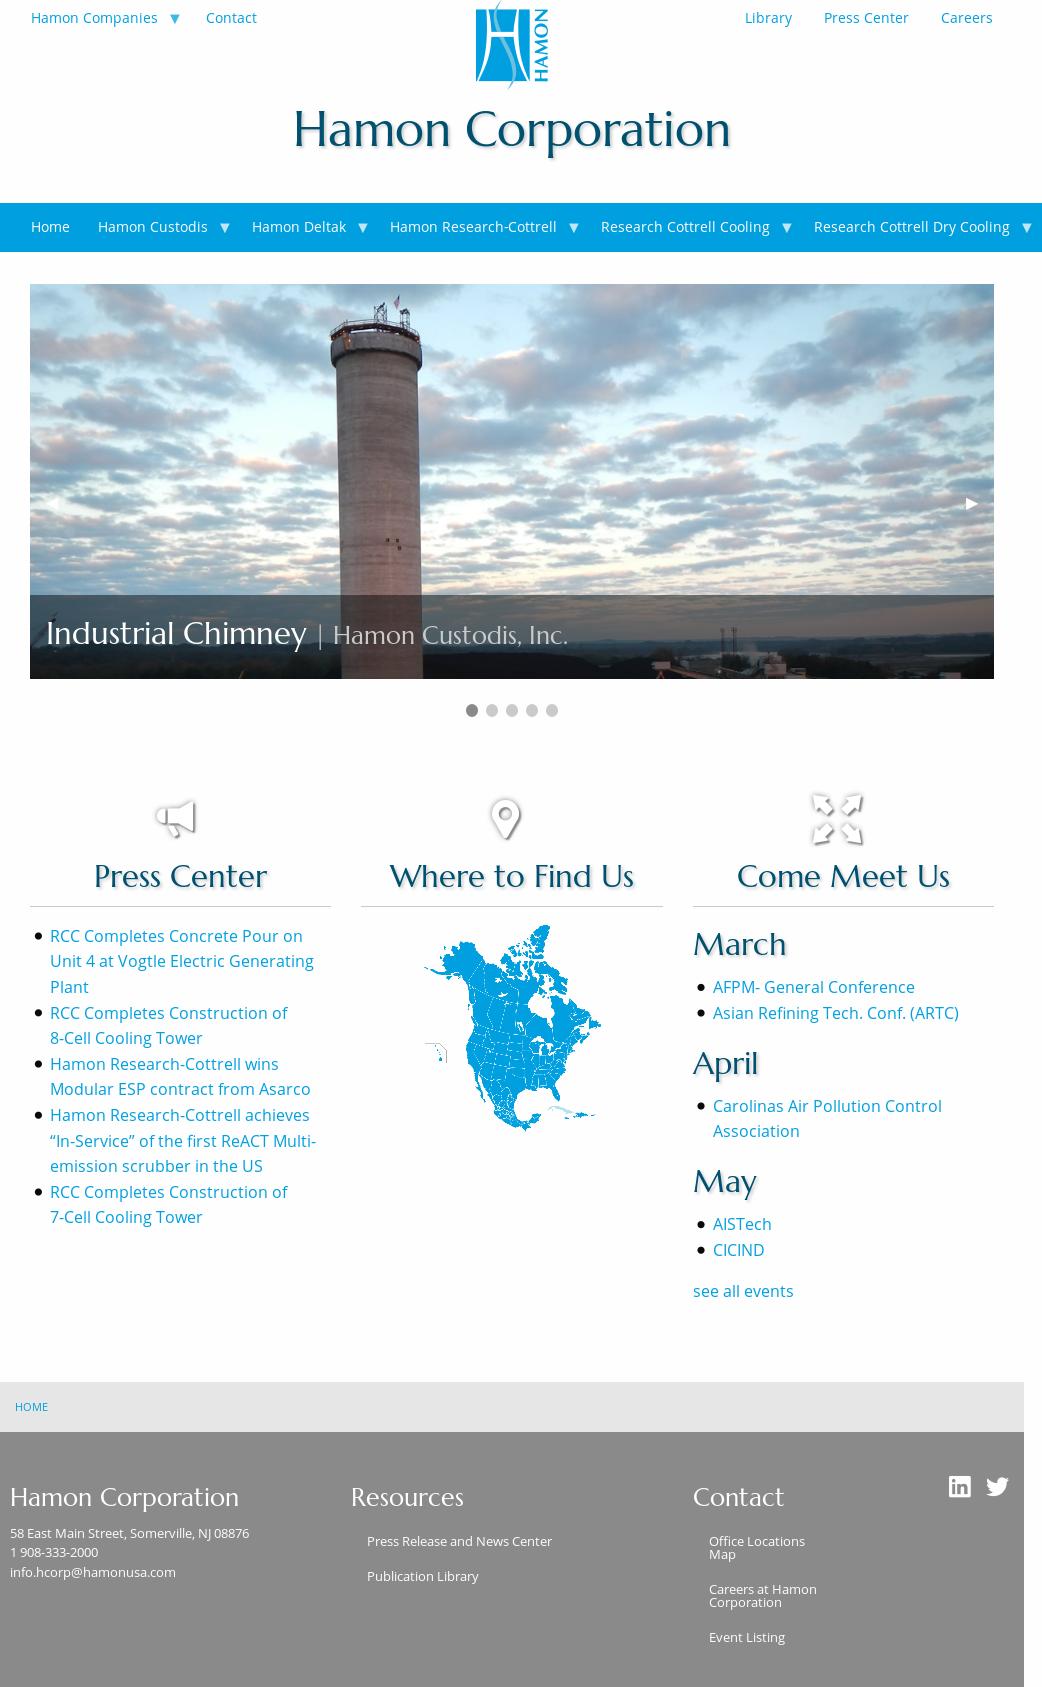 Hamon Deltak Competitors, Revenue and Employees - Owler Company Profile